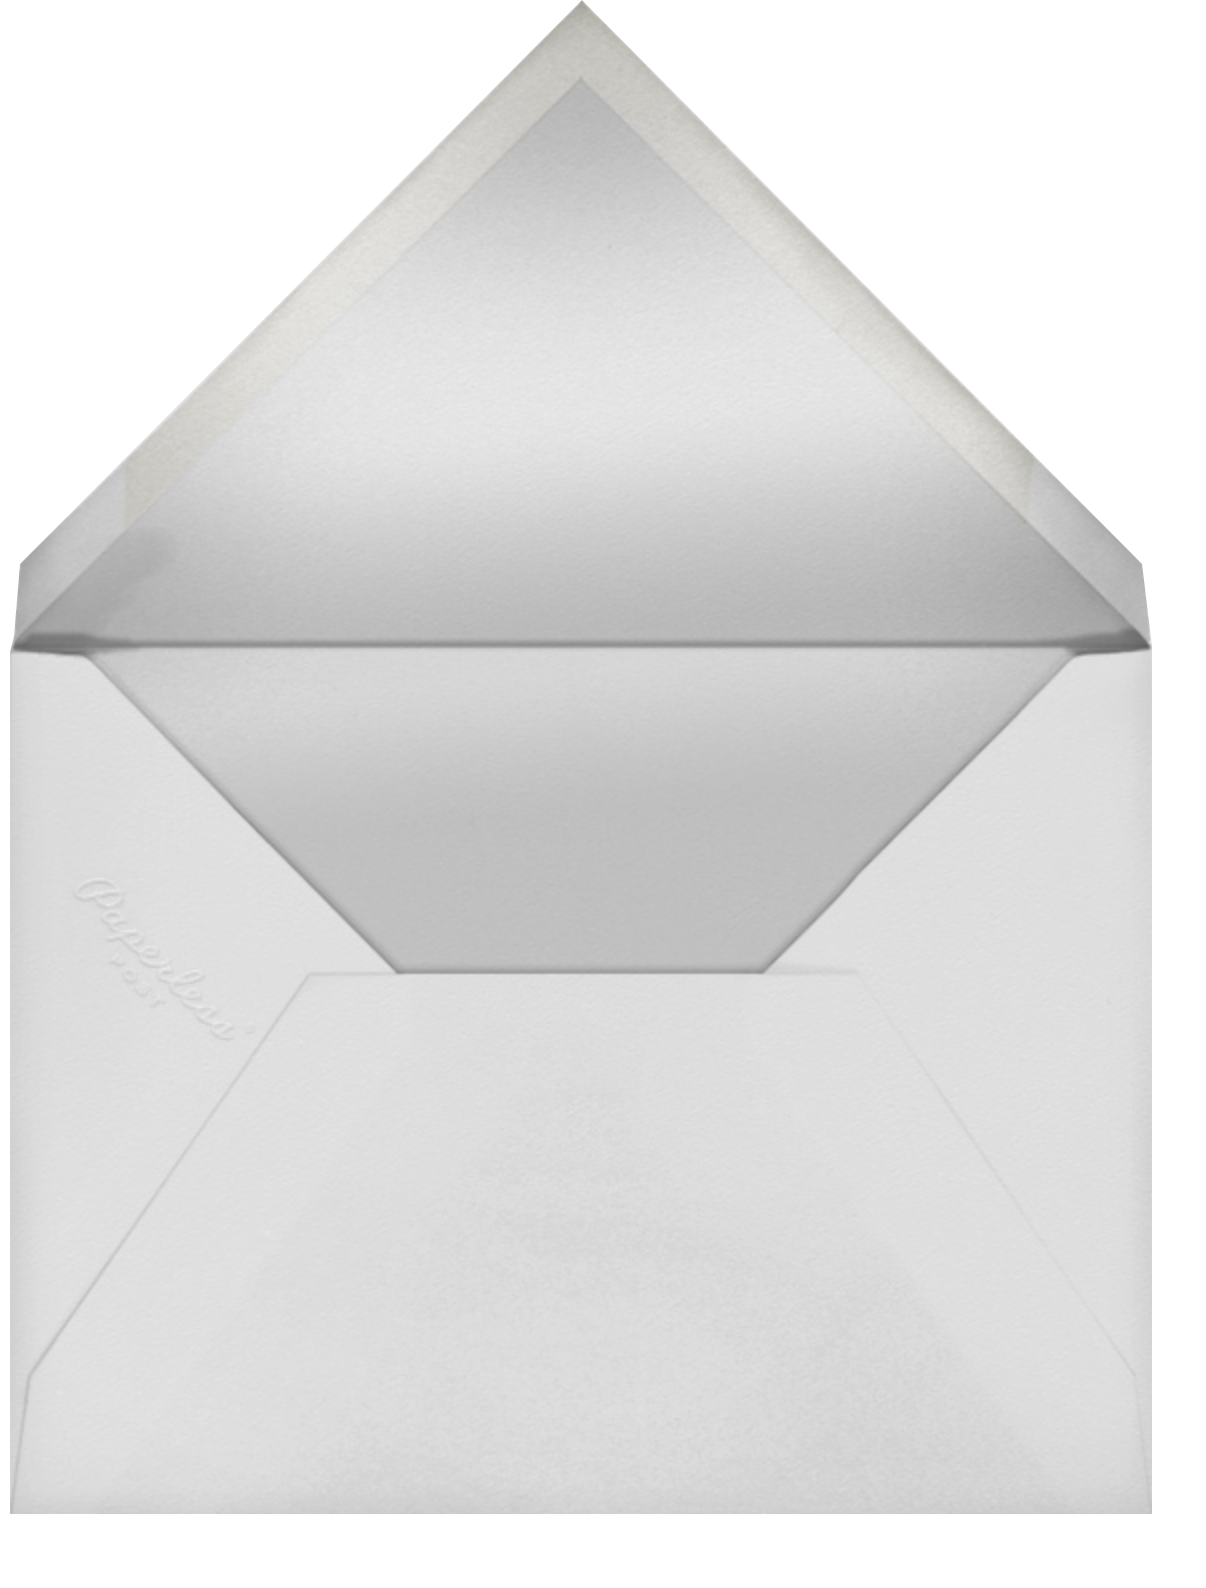 Daphne (Program) - Medium Gold - Crane & Co. - Menus and programs - envelope back